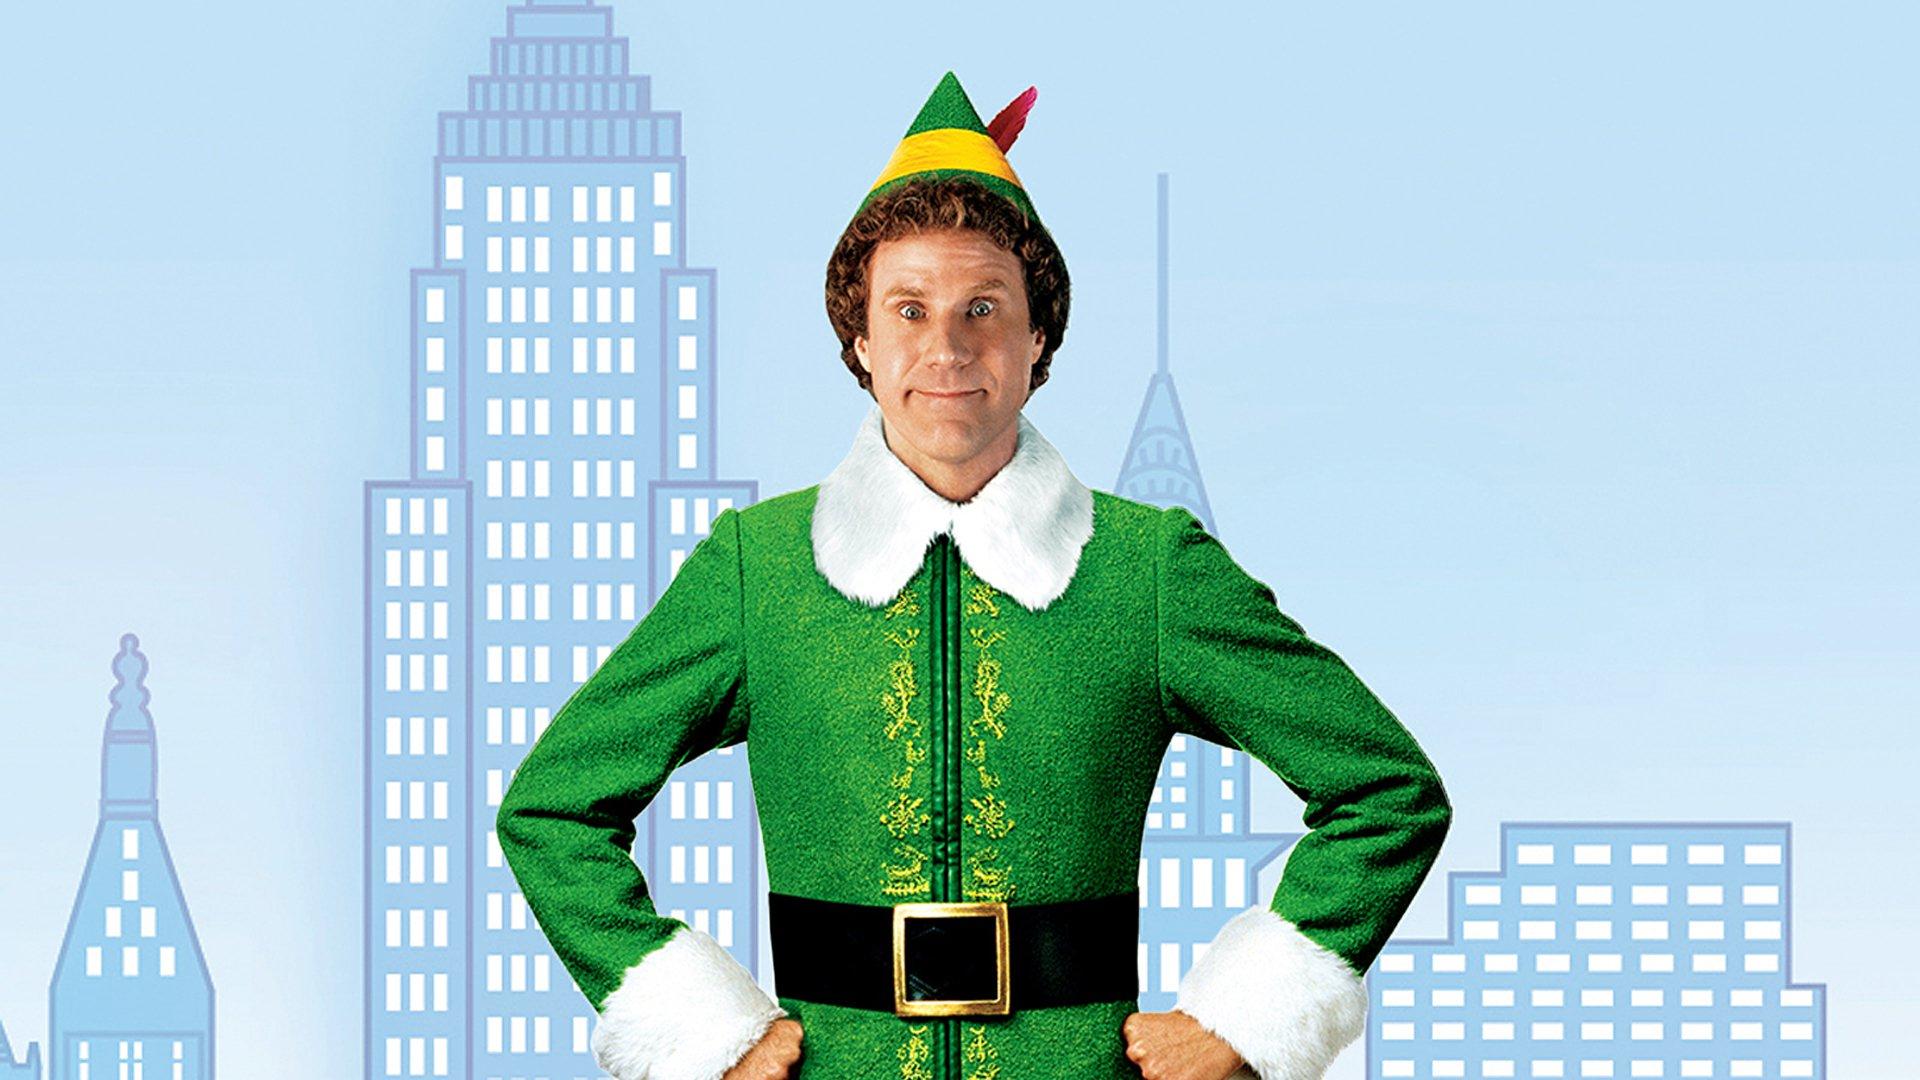 Elf the movie on tv